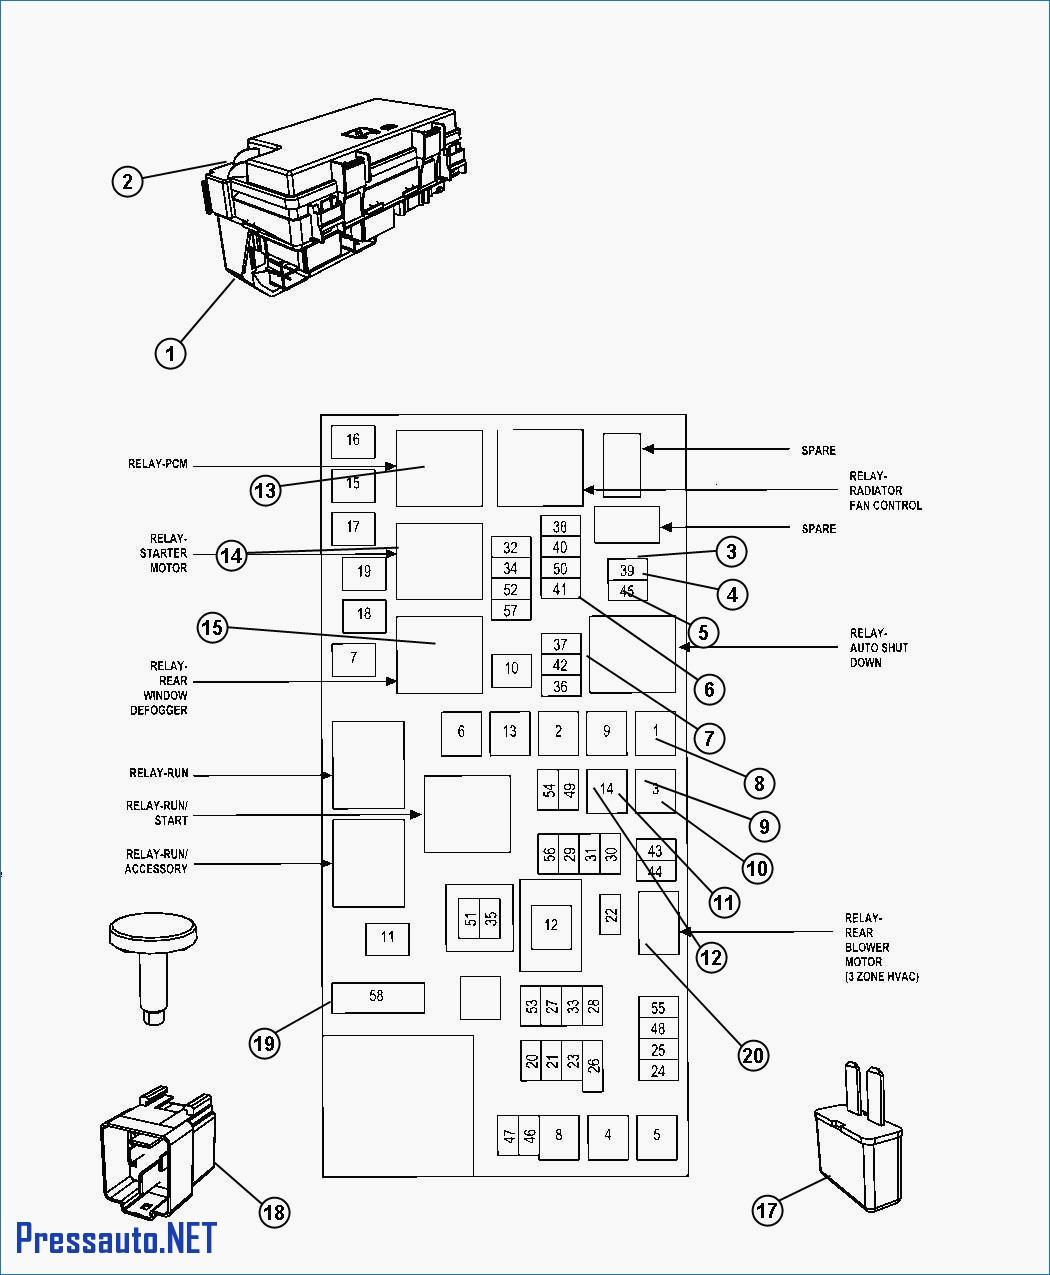 2012 dodge charger pursuit wiring diagram